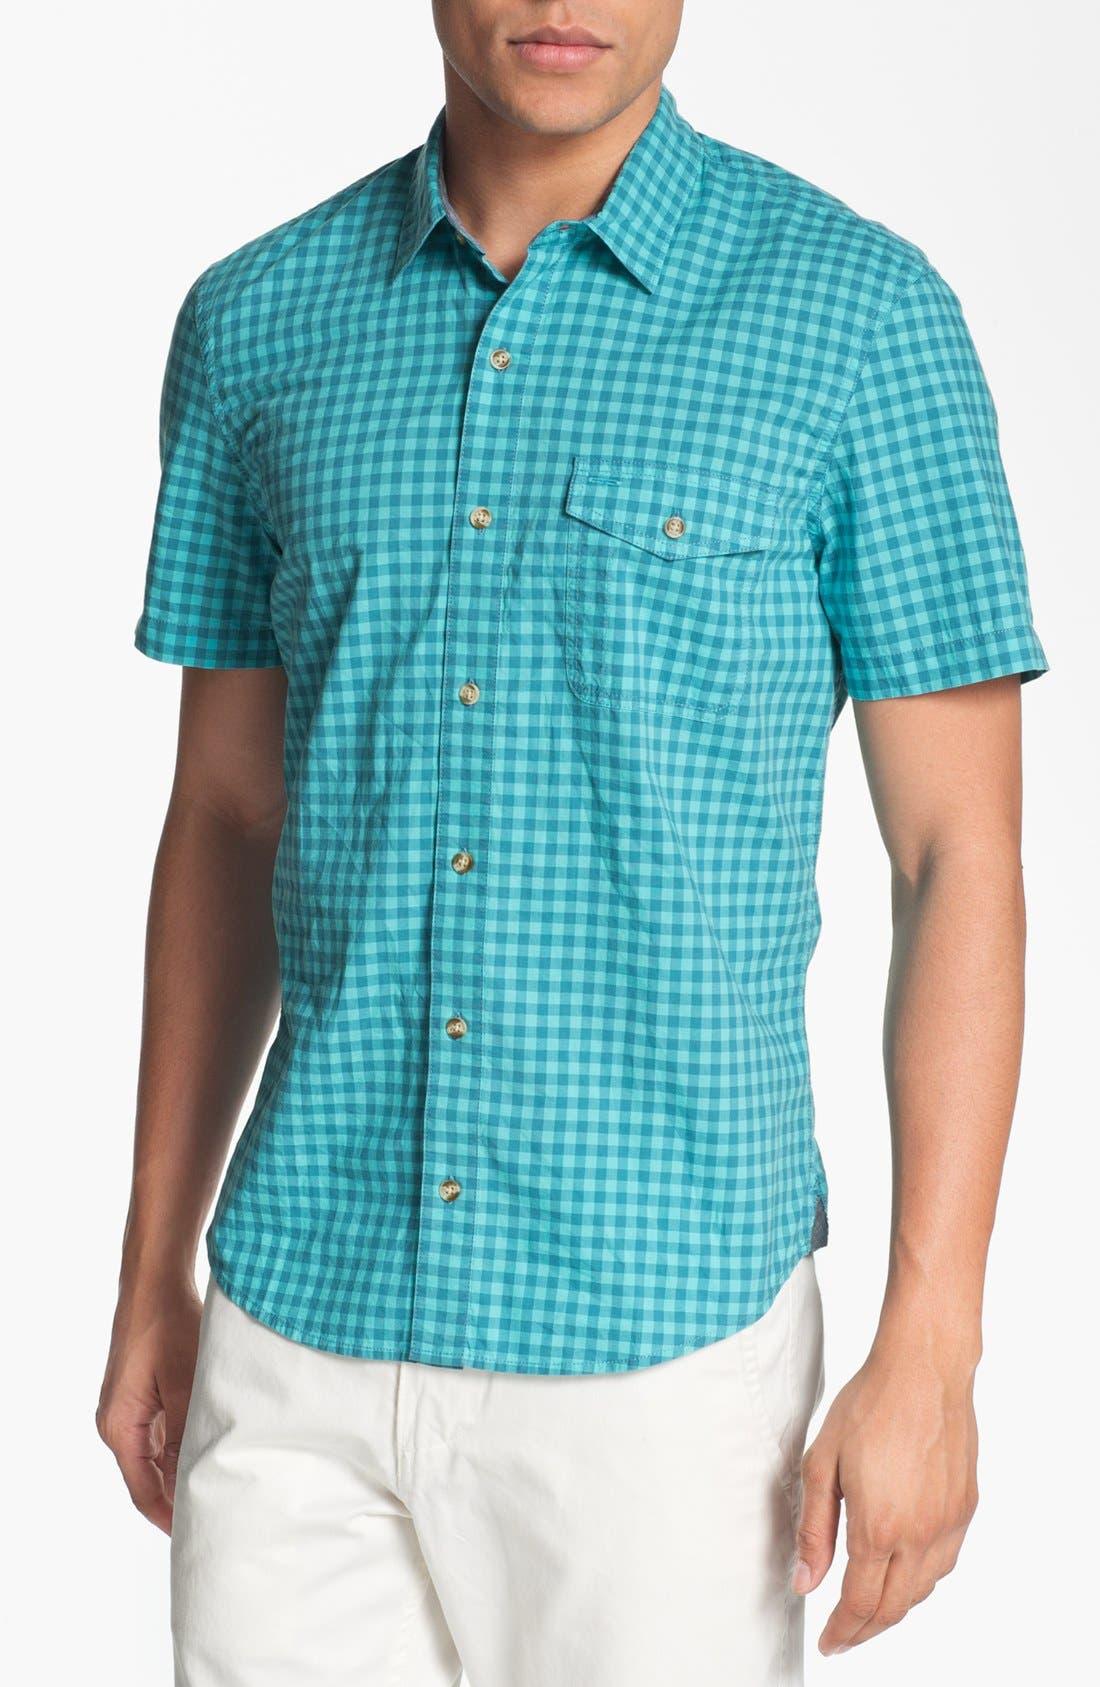 Main Image - 1901 Plaid Short Sleeve Woven Shirt